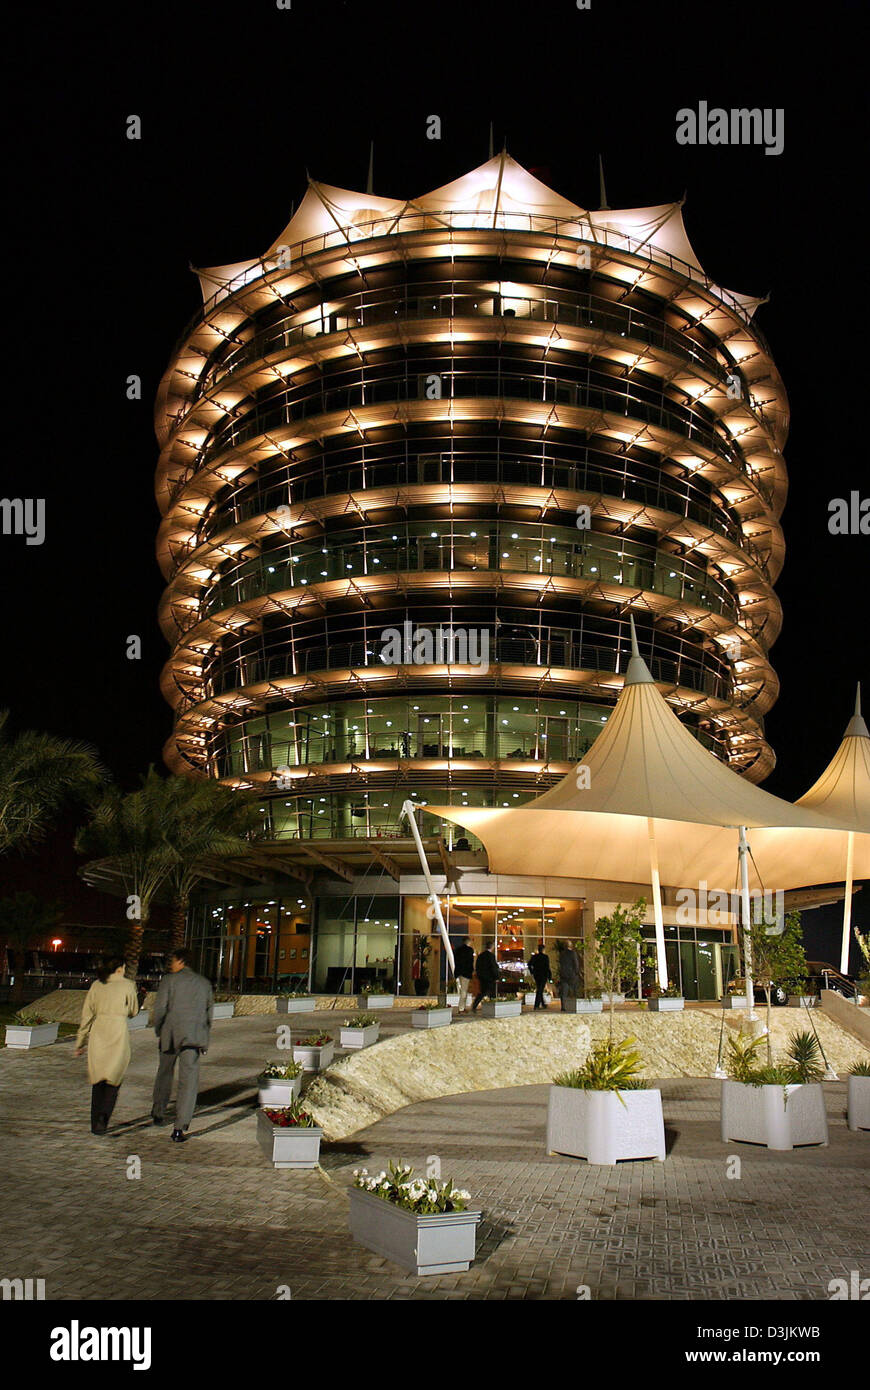 (dpa) - View of the illuminated visitor tower at the Formula 1 race track near Manama, Bahrain, 14 February 2005. - Stock Image